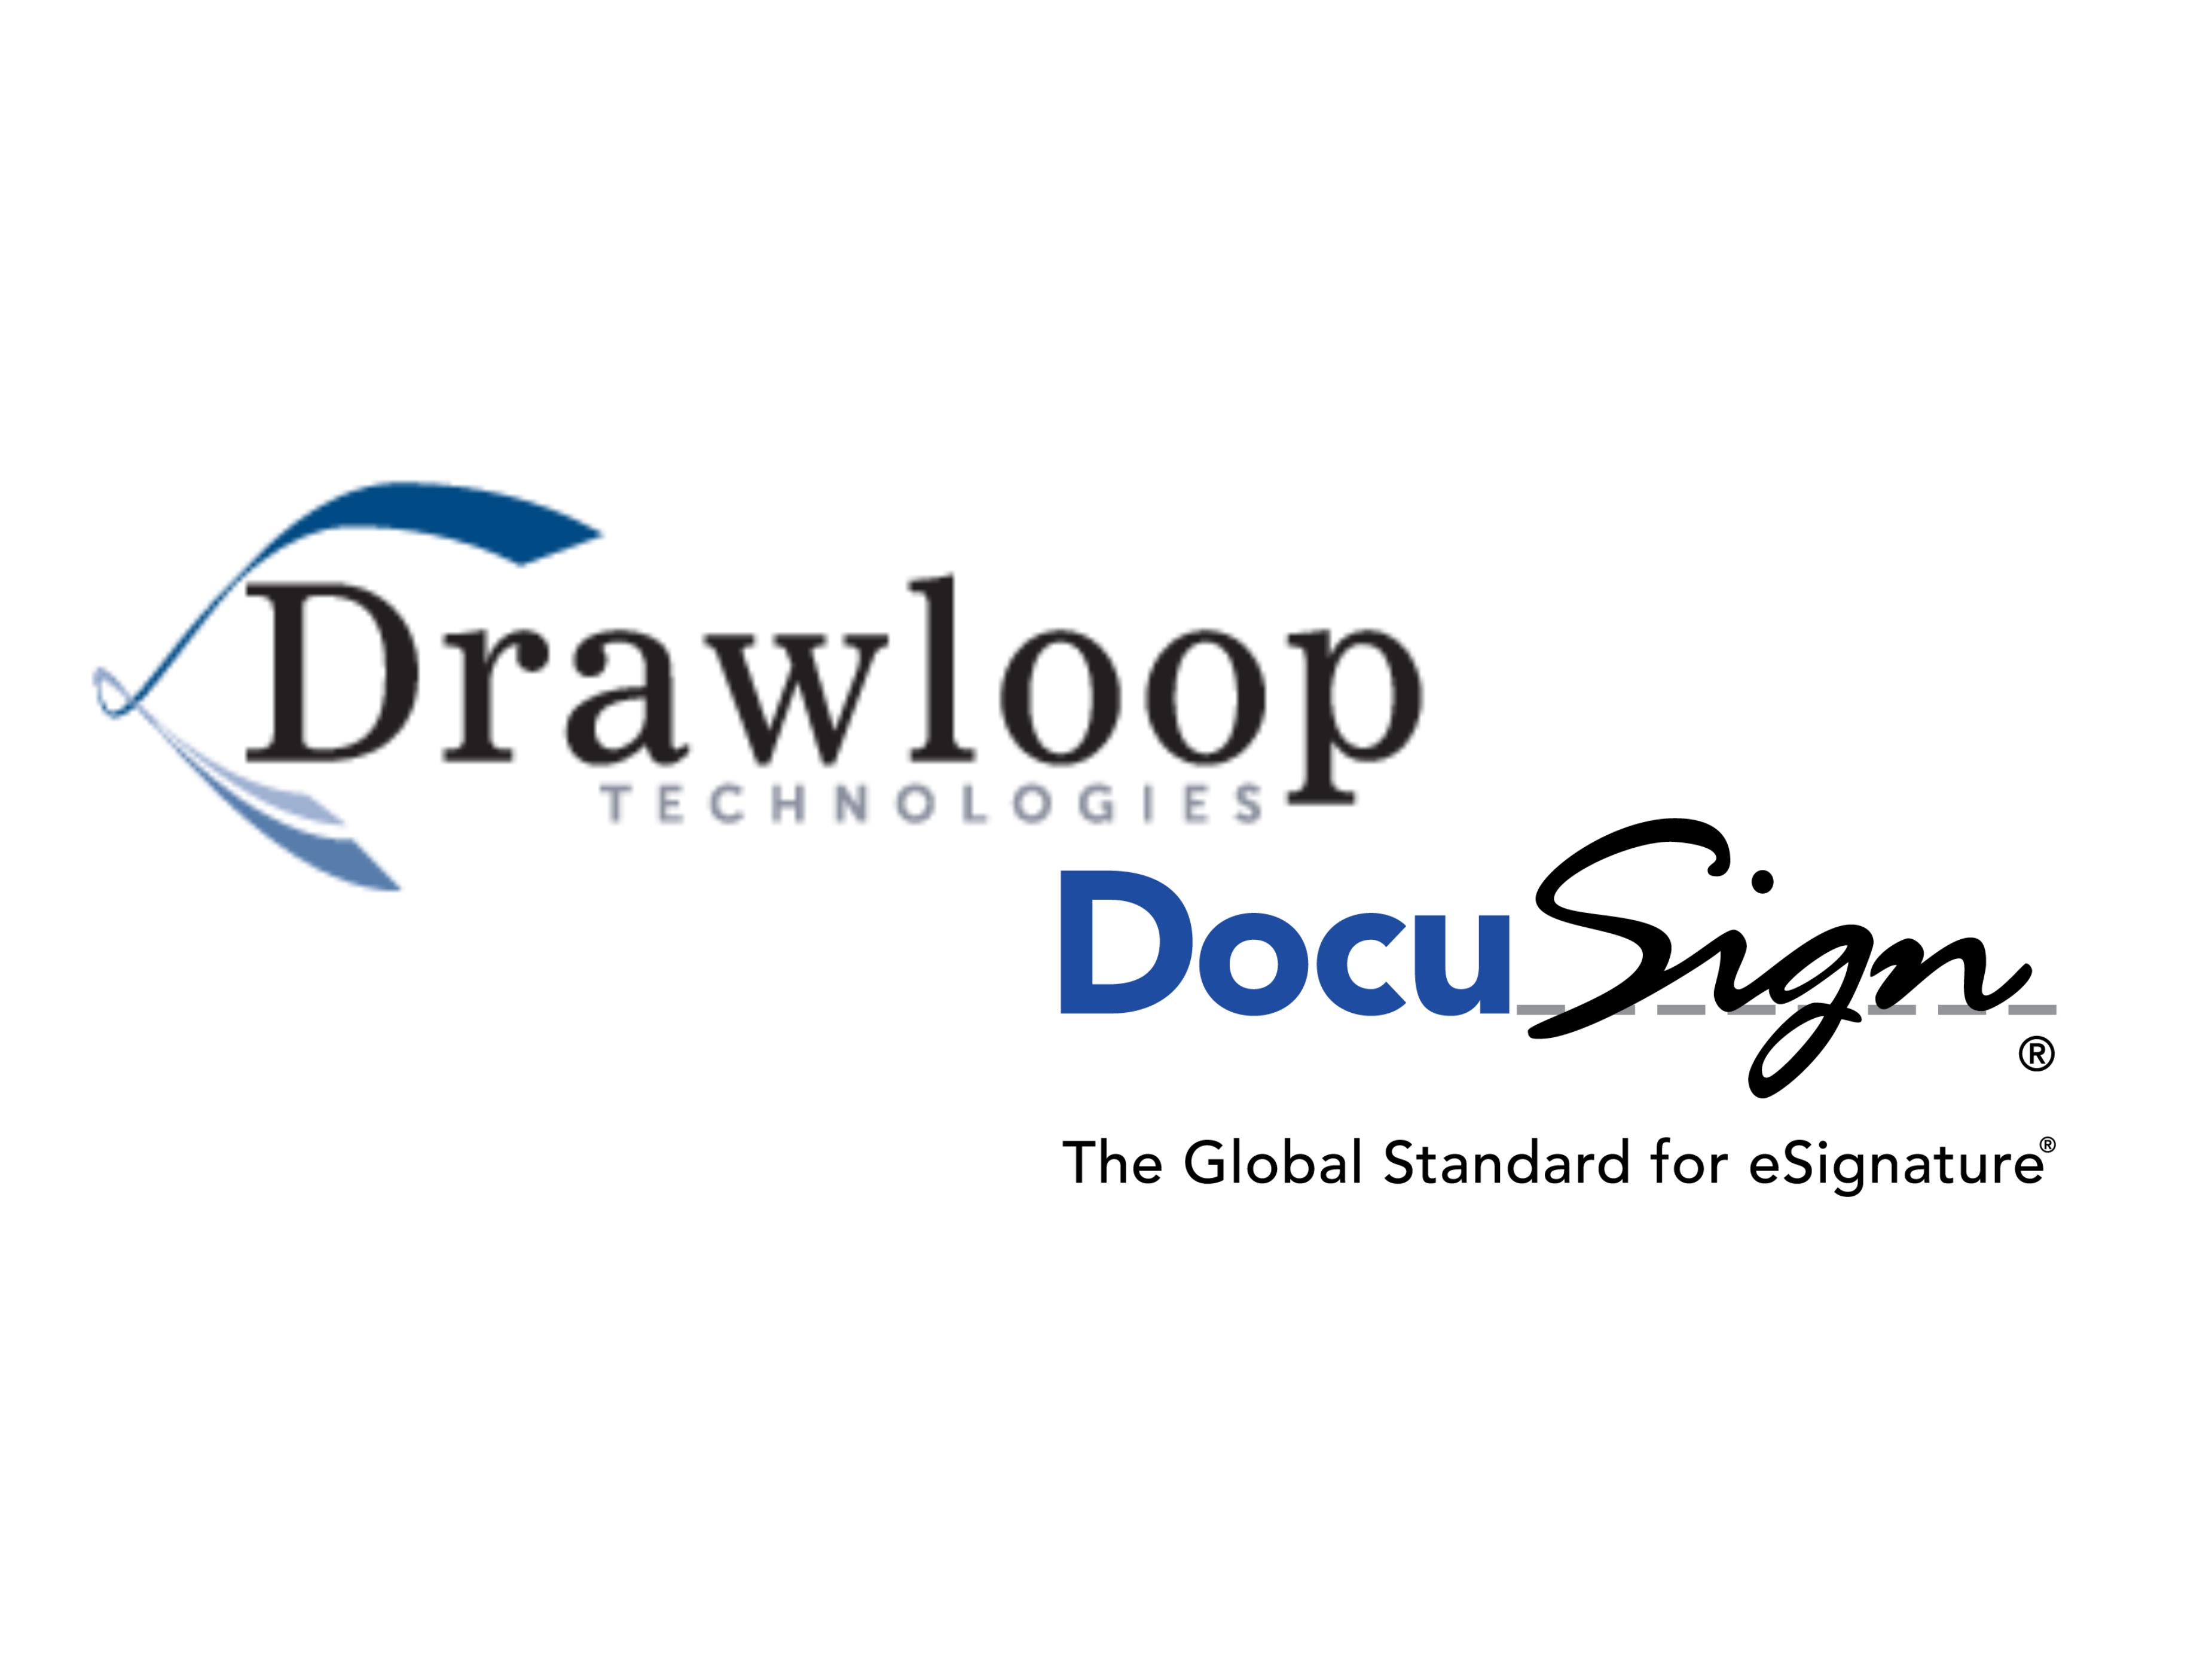 DrawLOOP / DocuSign Integration